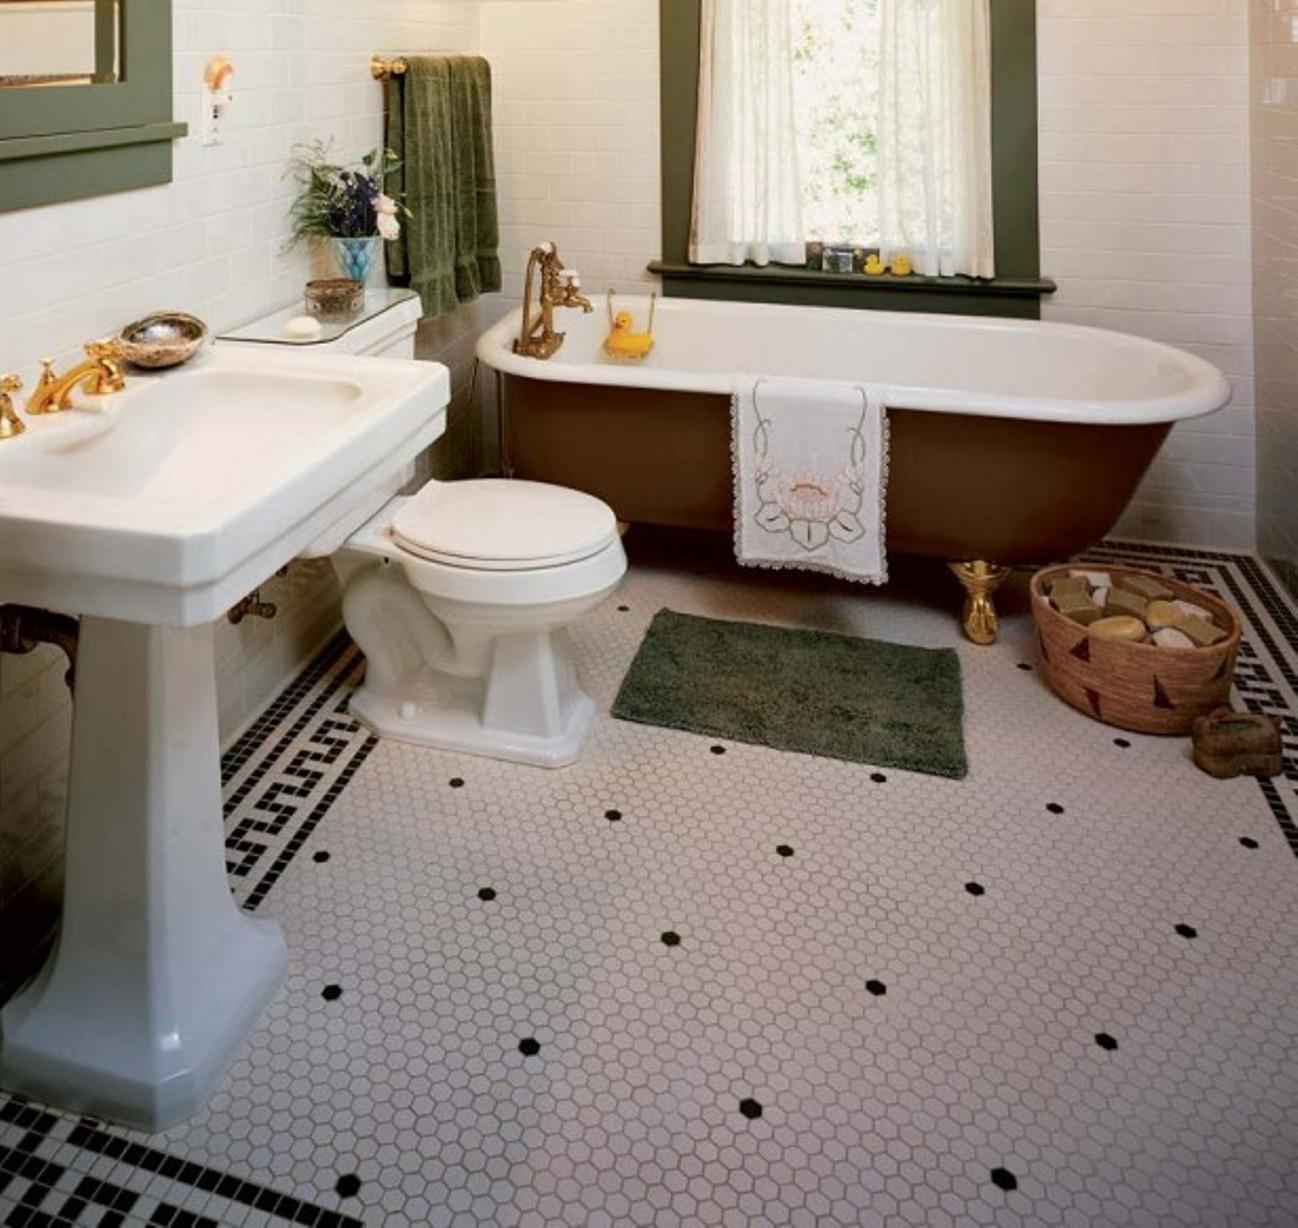 bathroom-flooring-ideas-hexagonal-tiles-flooring-with-details